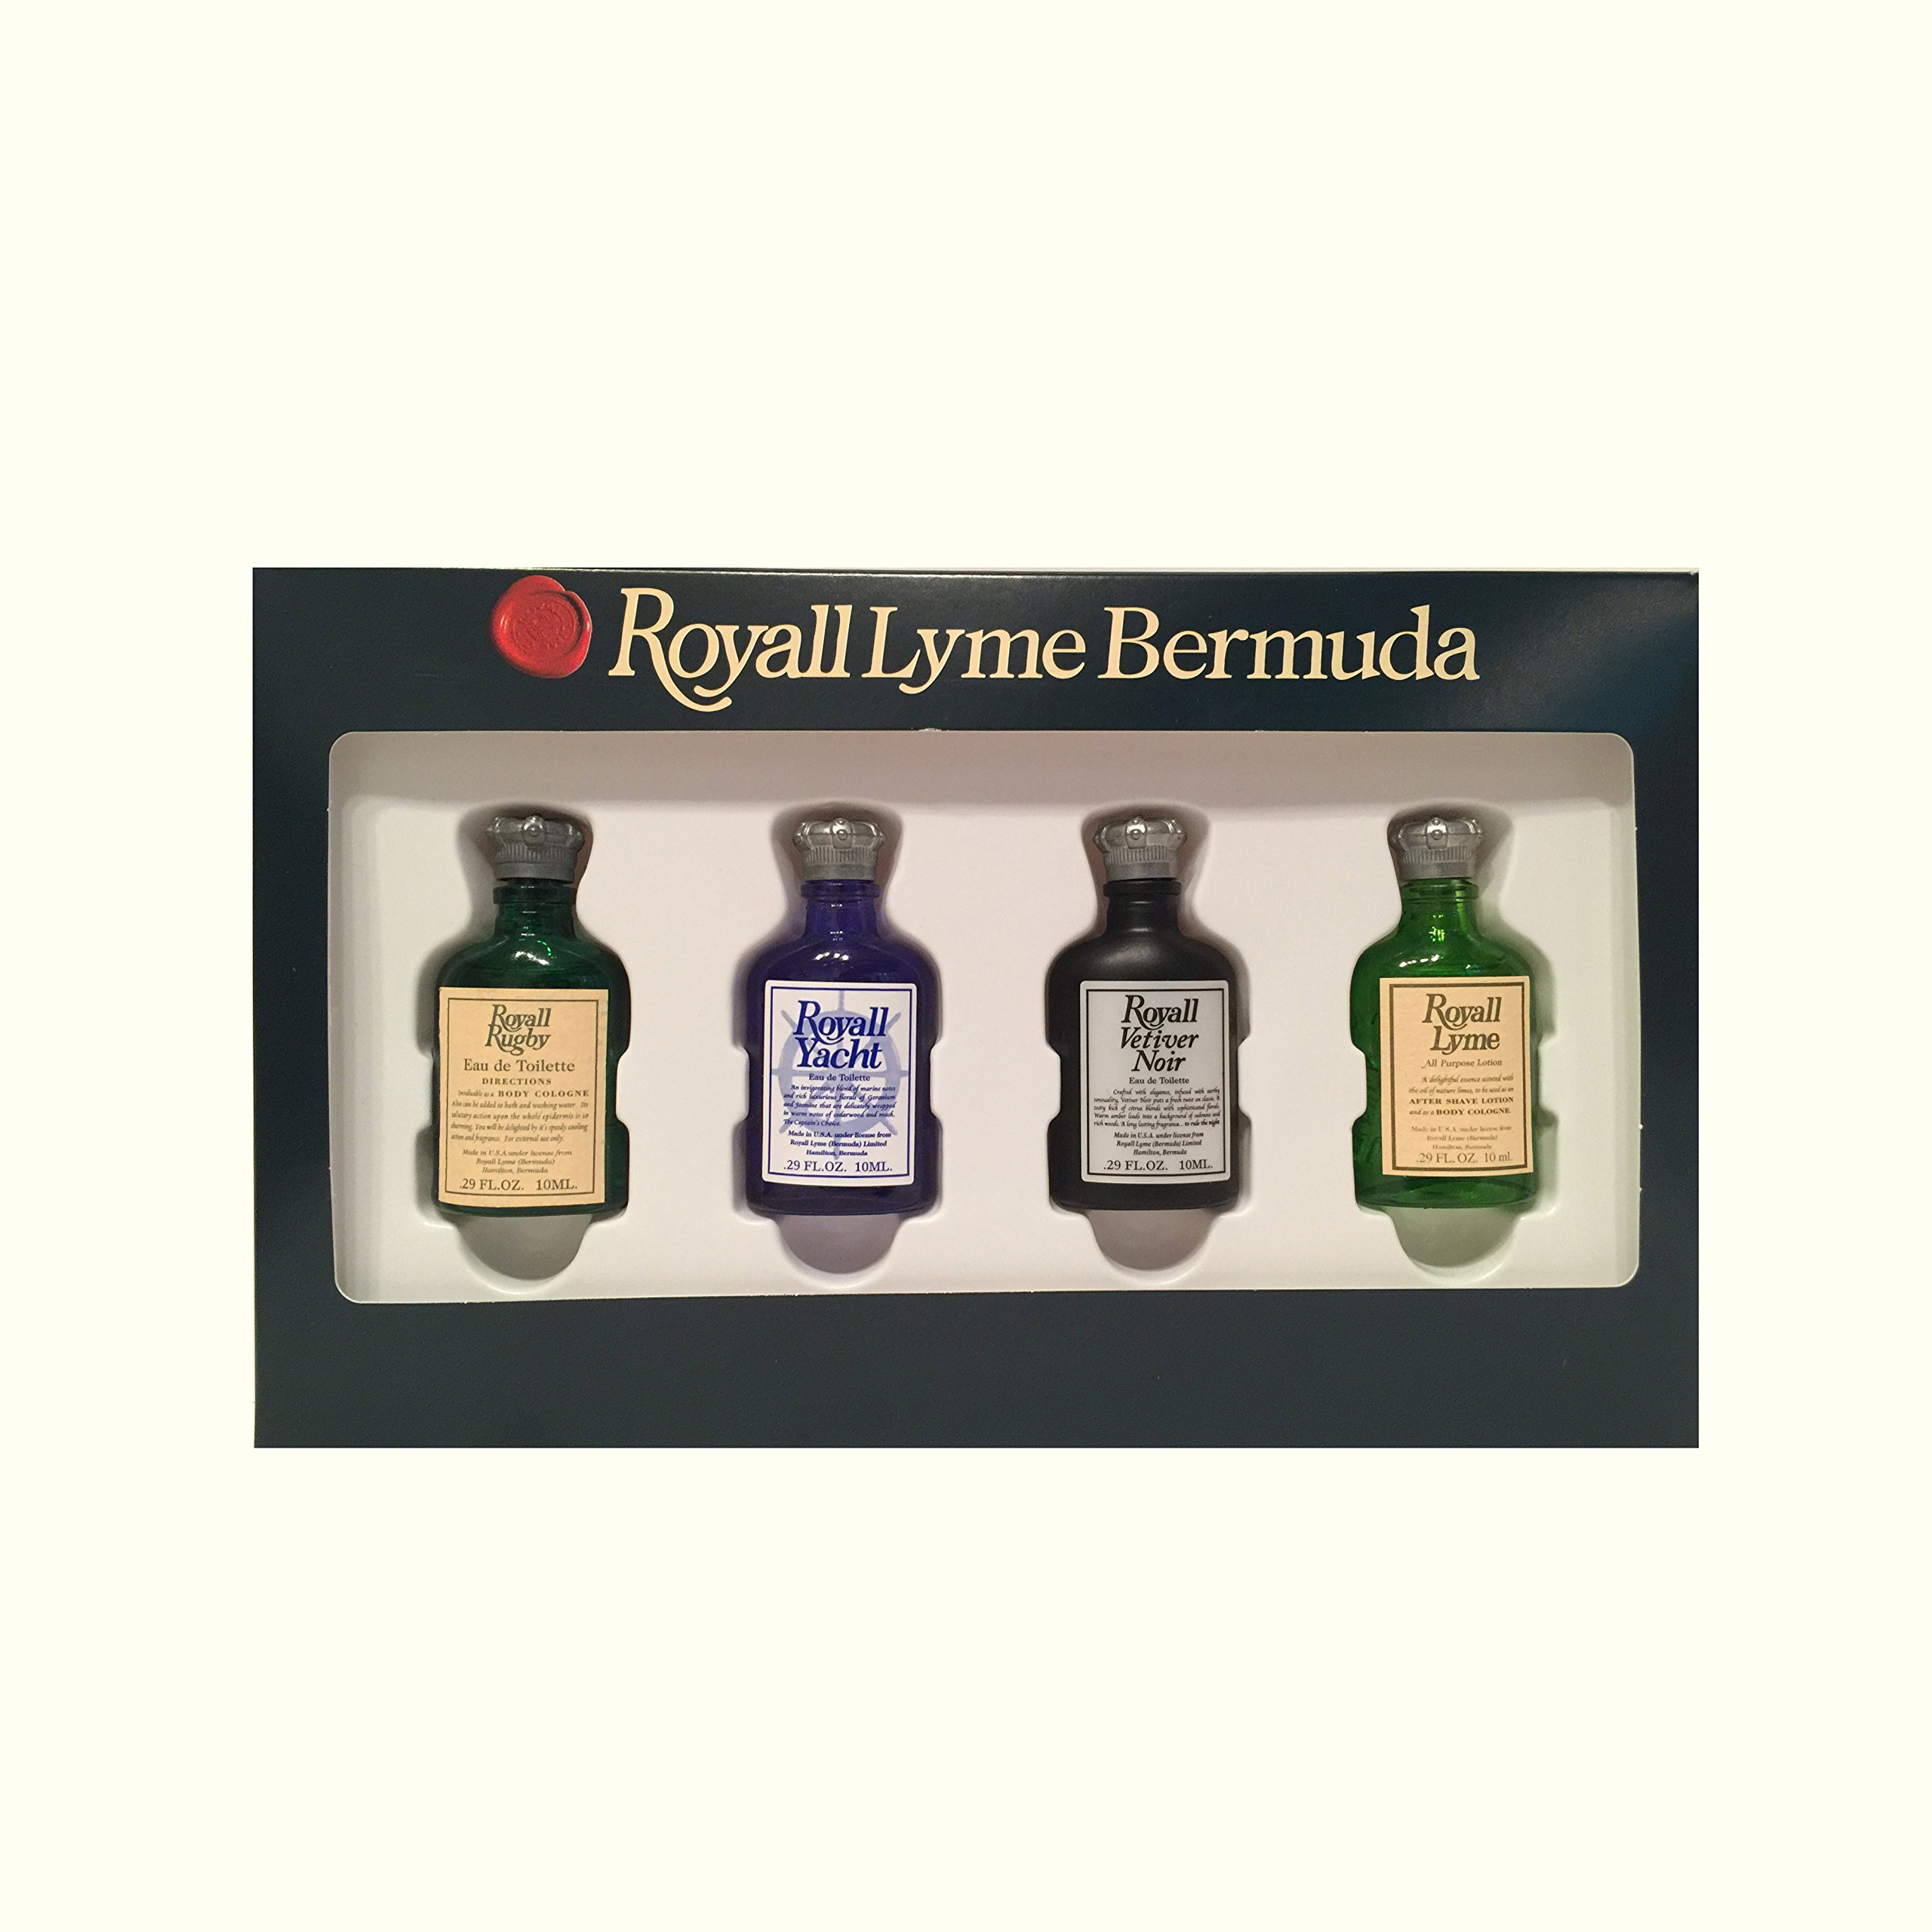 Royall Lyme Bermuda Collection The Royall Master Collection - Mini Set